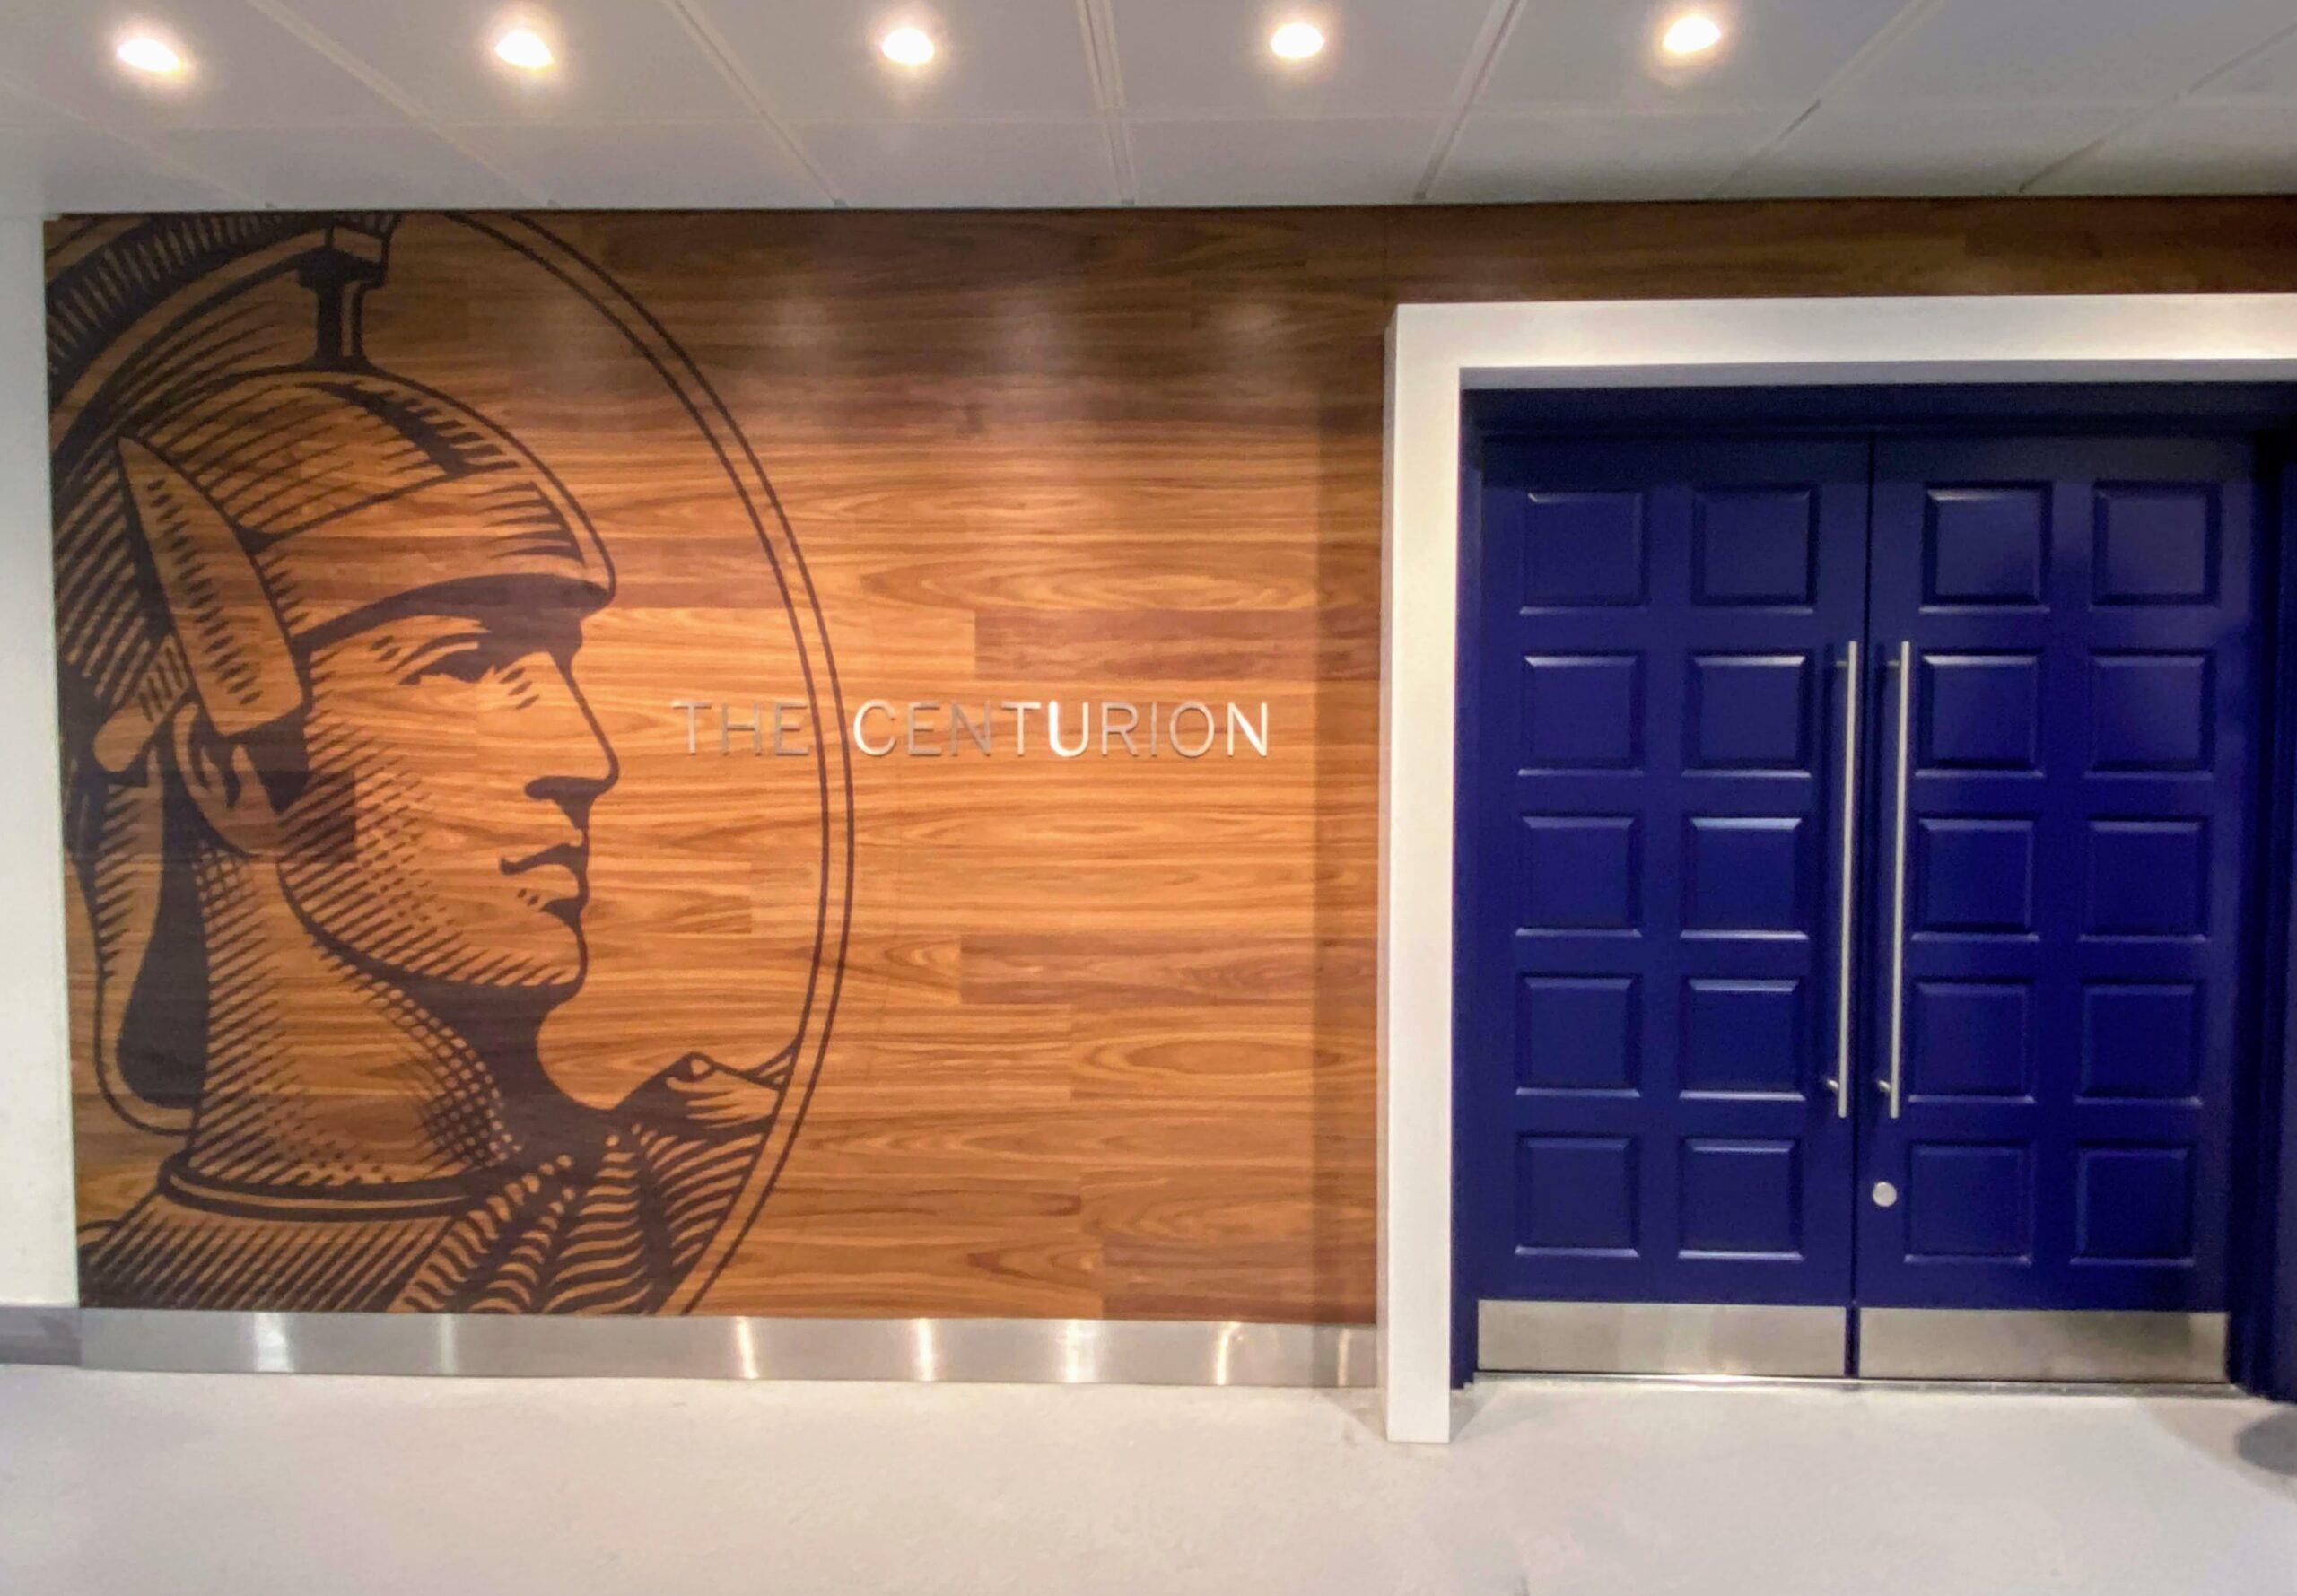 American Express New Centurion Lounge at London Heathrow T3